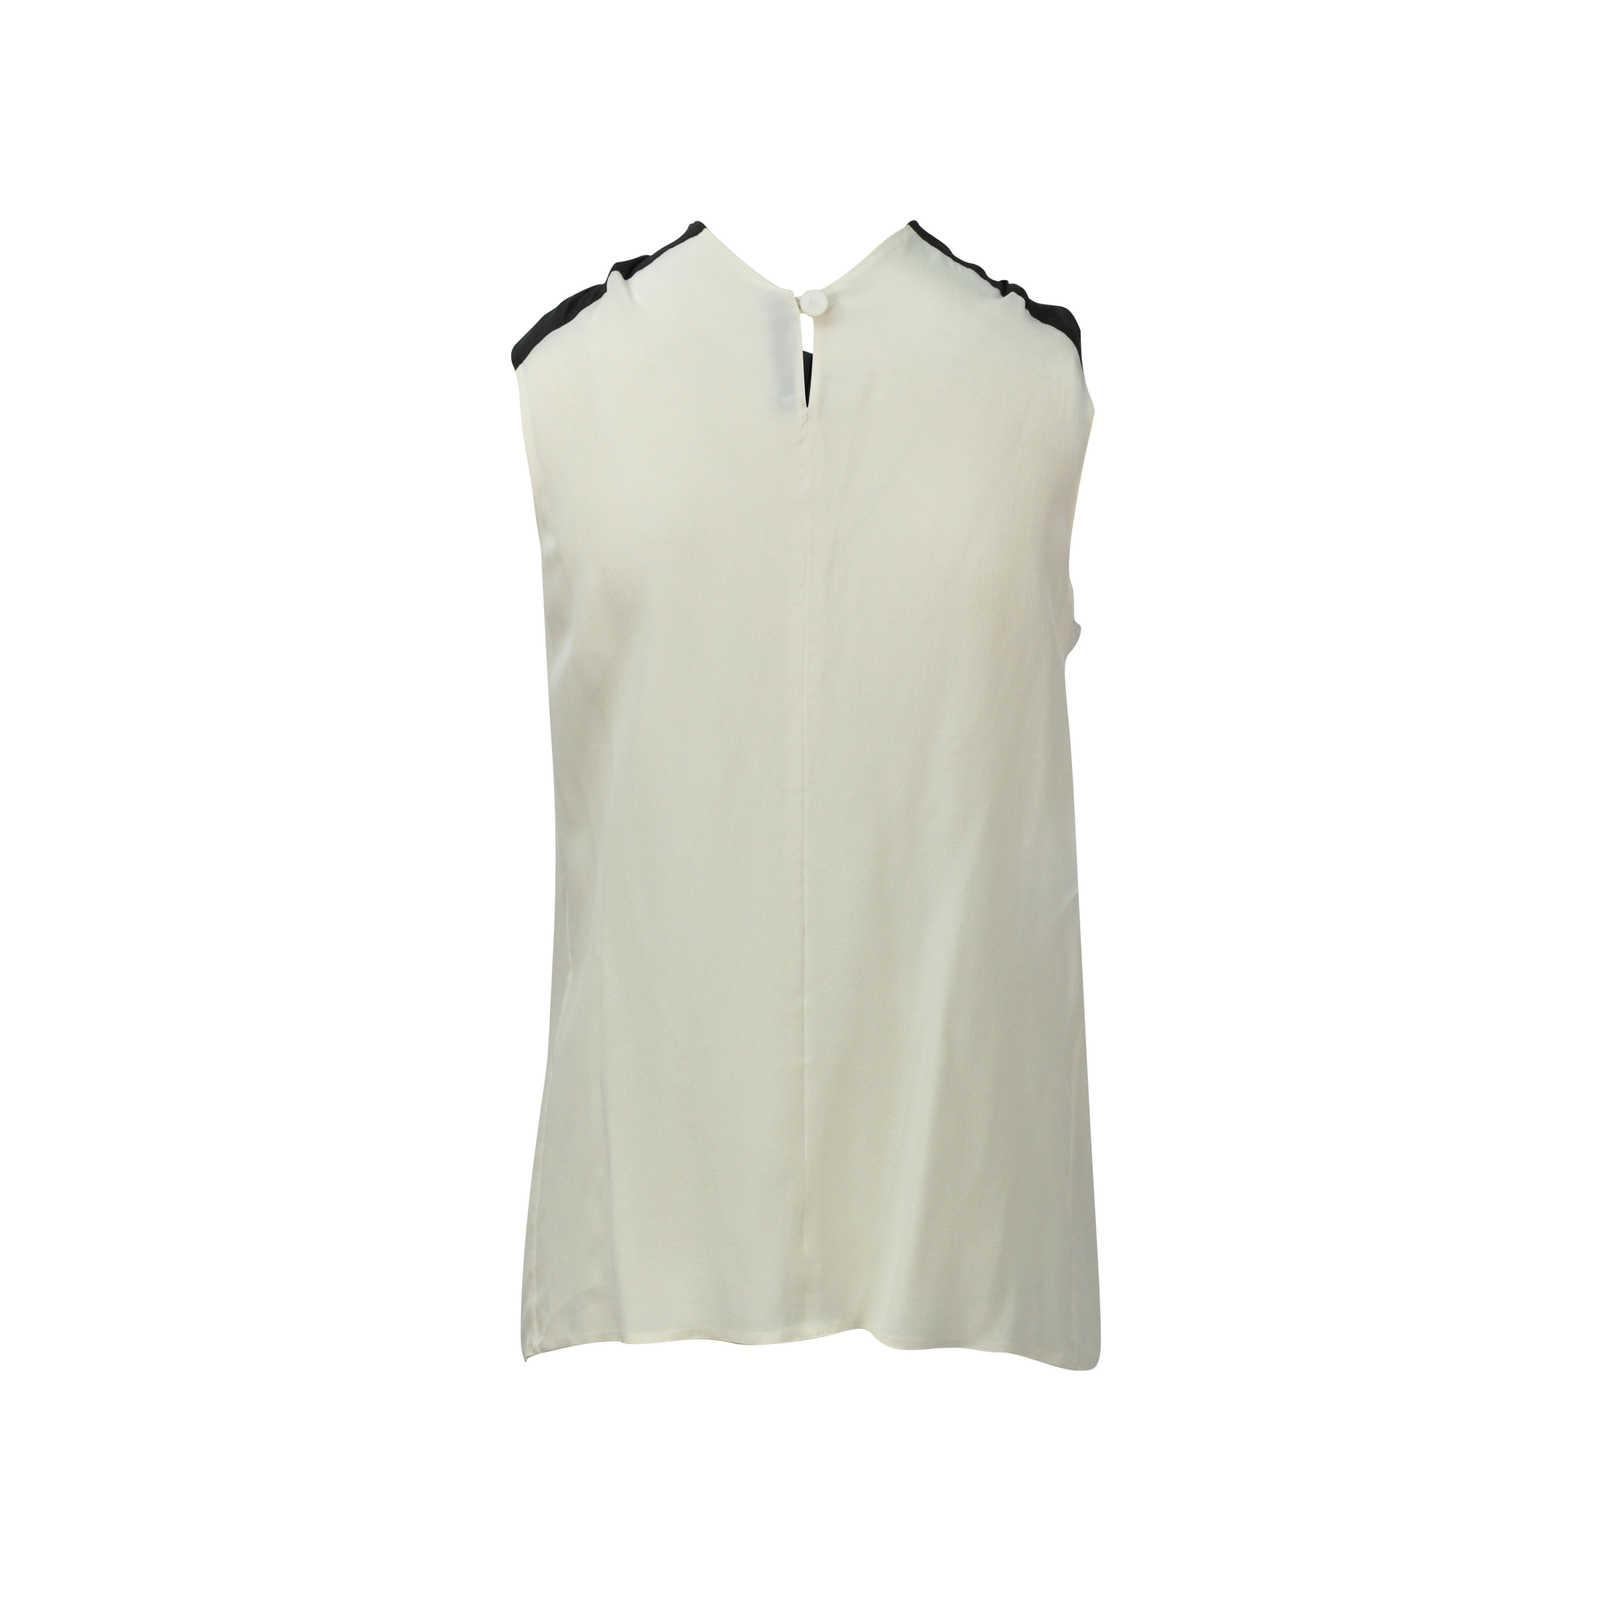 c321dc6380511 ... Authentic Second Hand Prada Tie Neck Silk Top (PSS-080-00114) ...